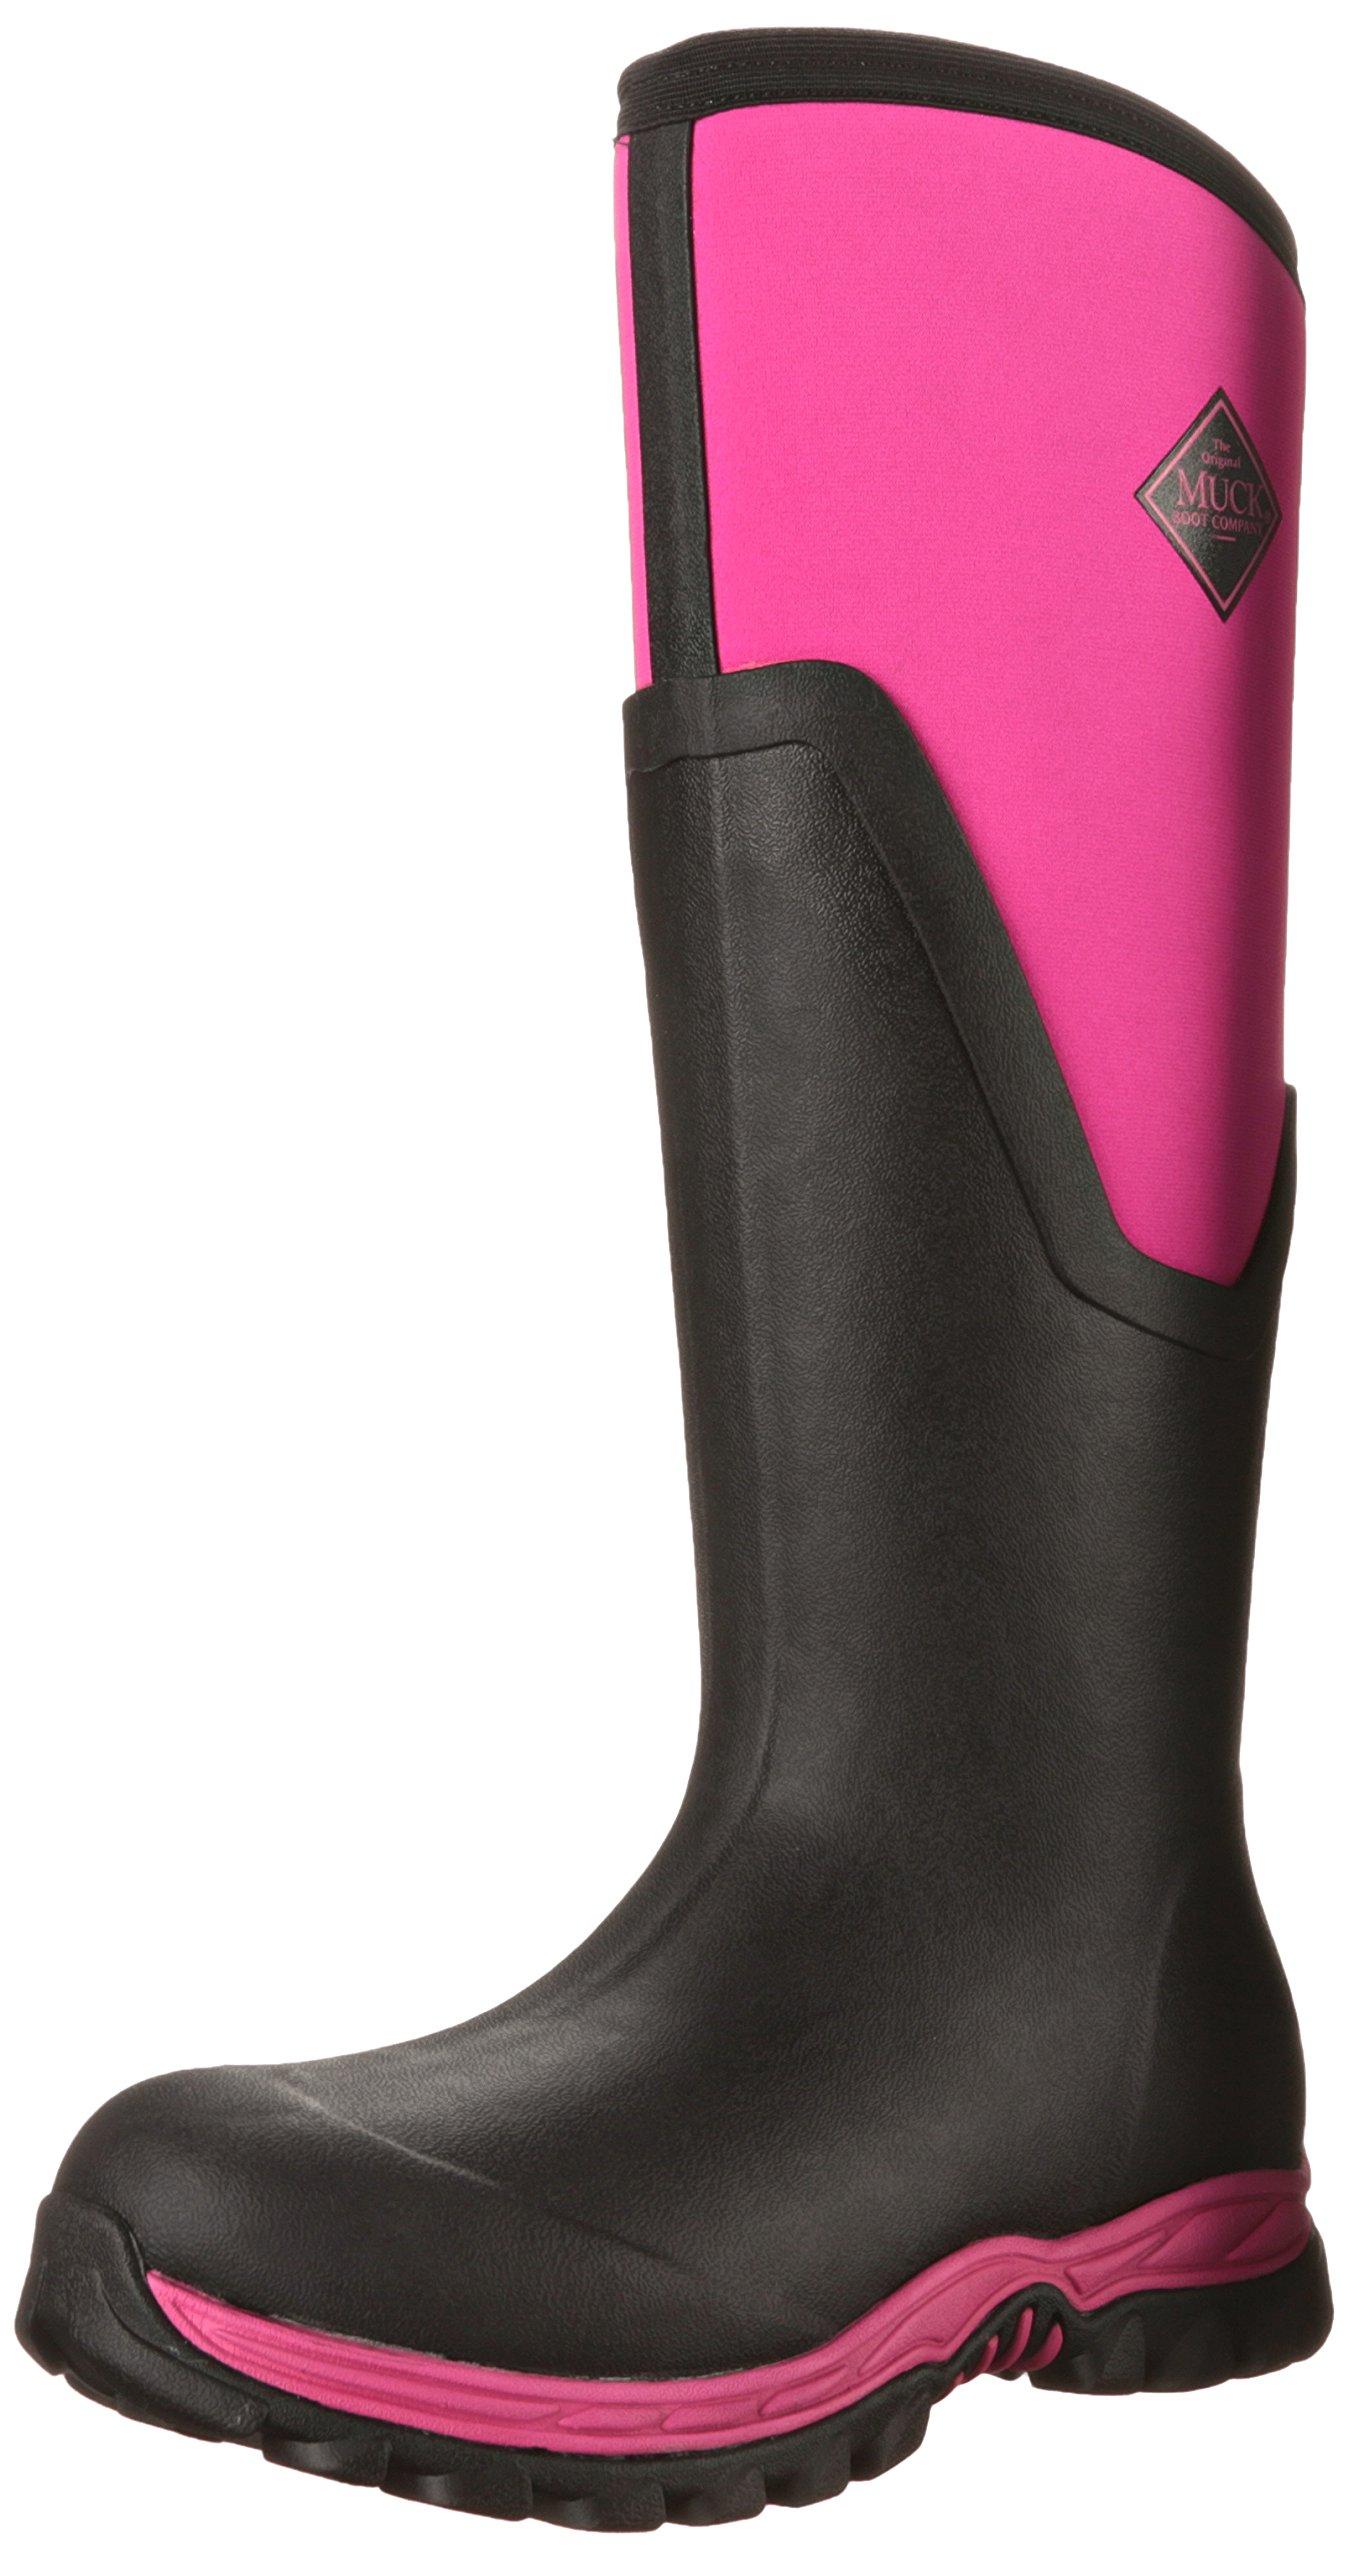 Eu Arctic Pluie pink42 FemmeRoseblack TallBottesamp; Muck Boots De Sport Ii Bottines ZiXPlOTwku